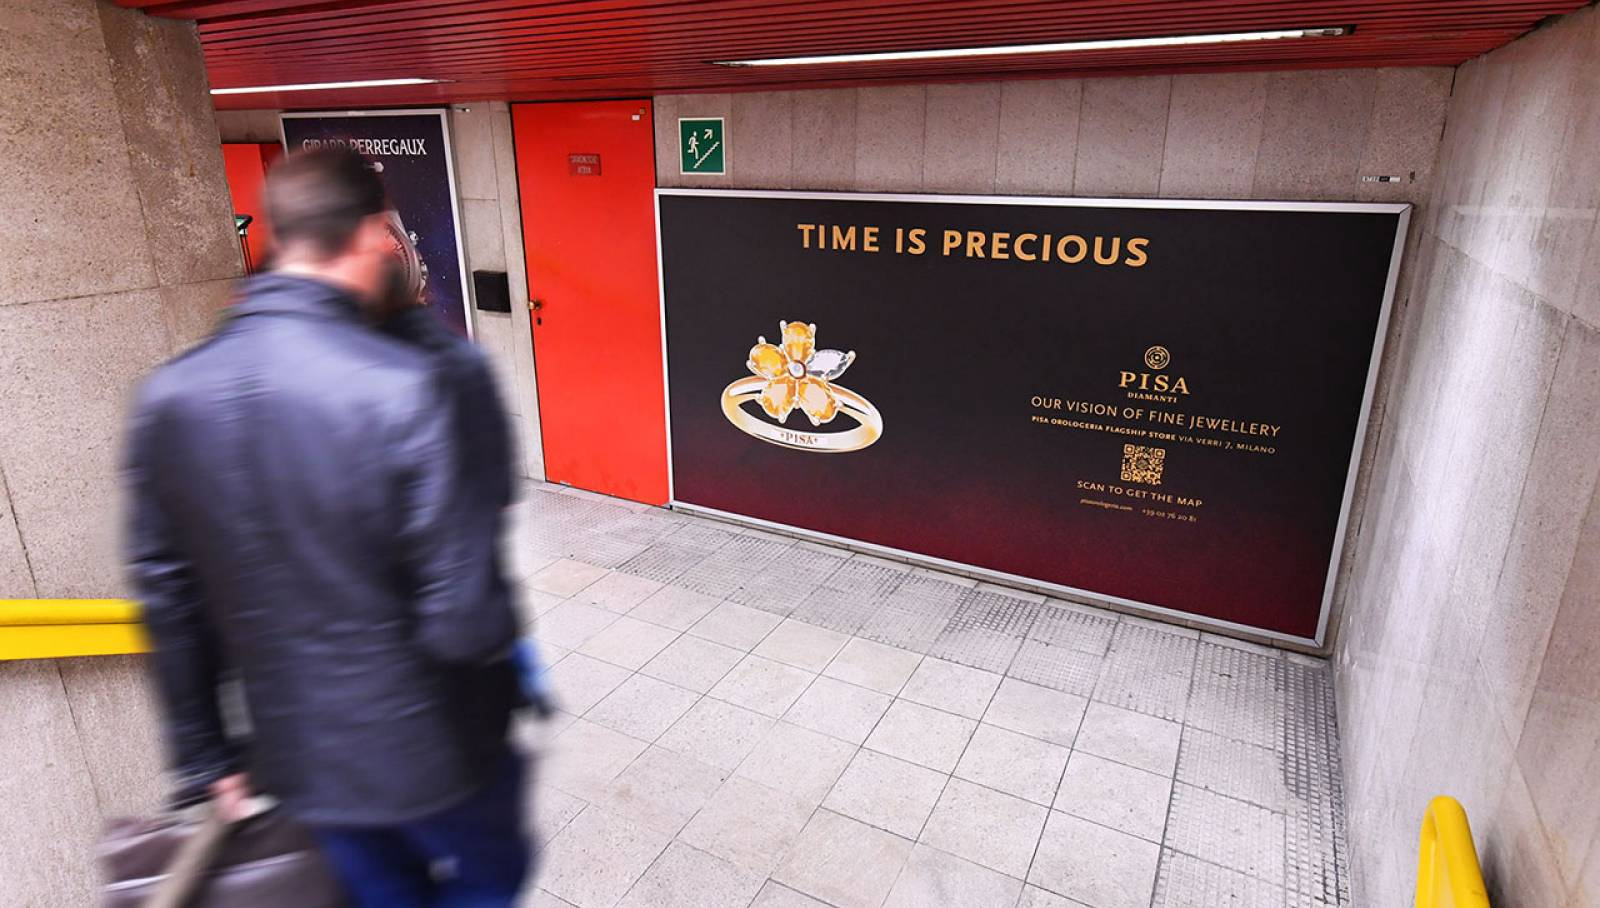 OOH IGPDecaux a Milano Station Domination Pisa Orologeria